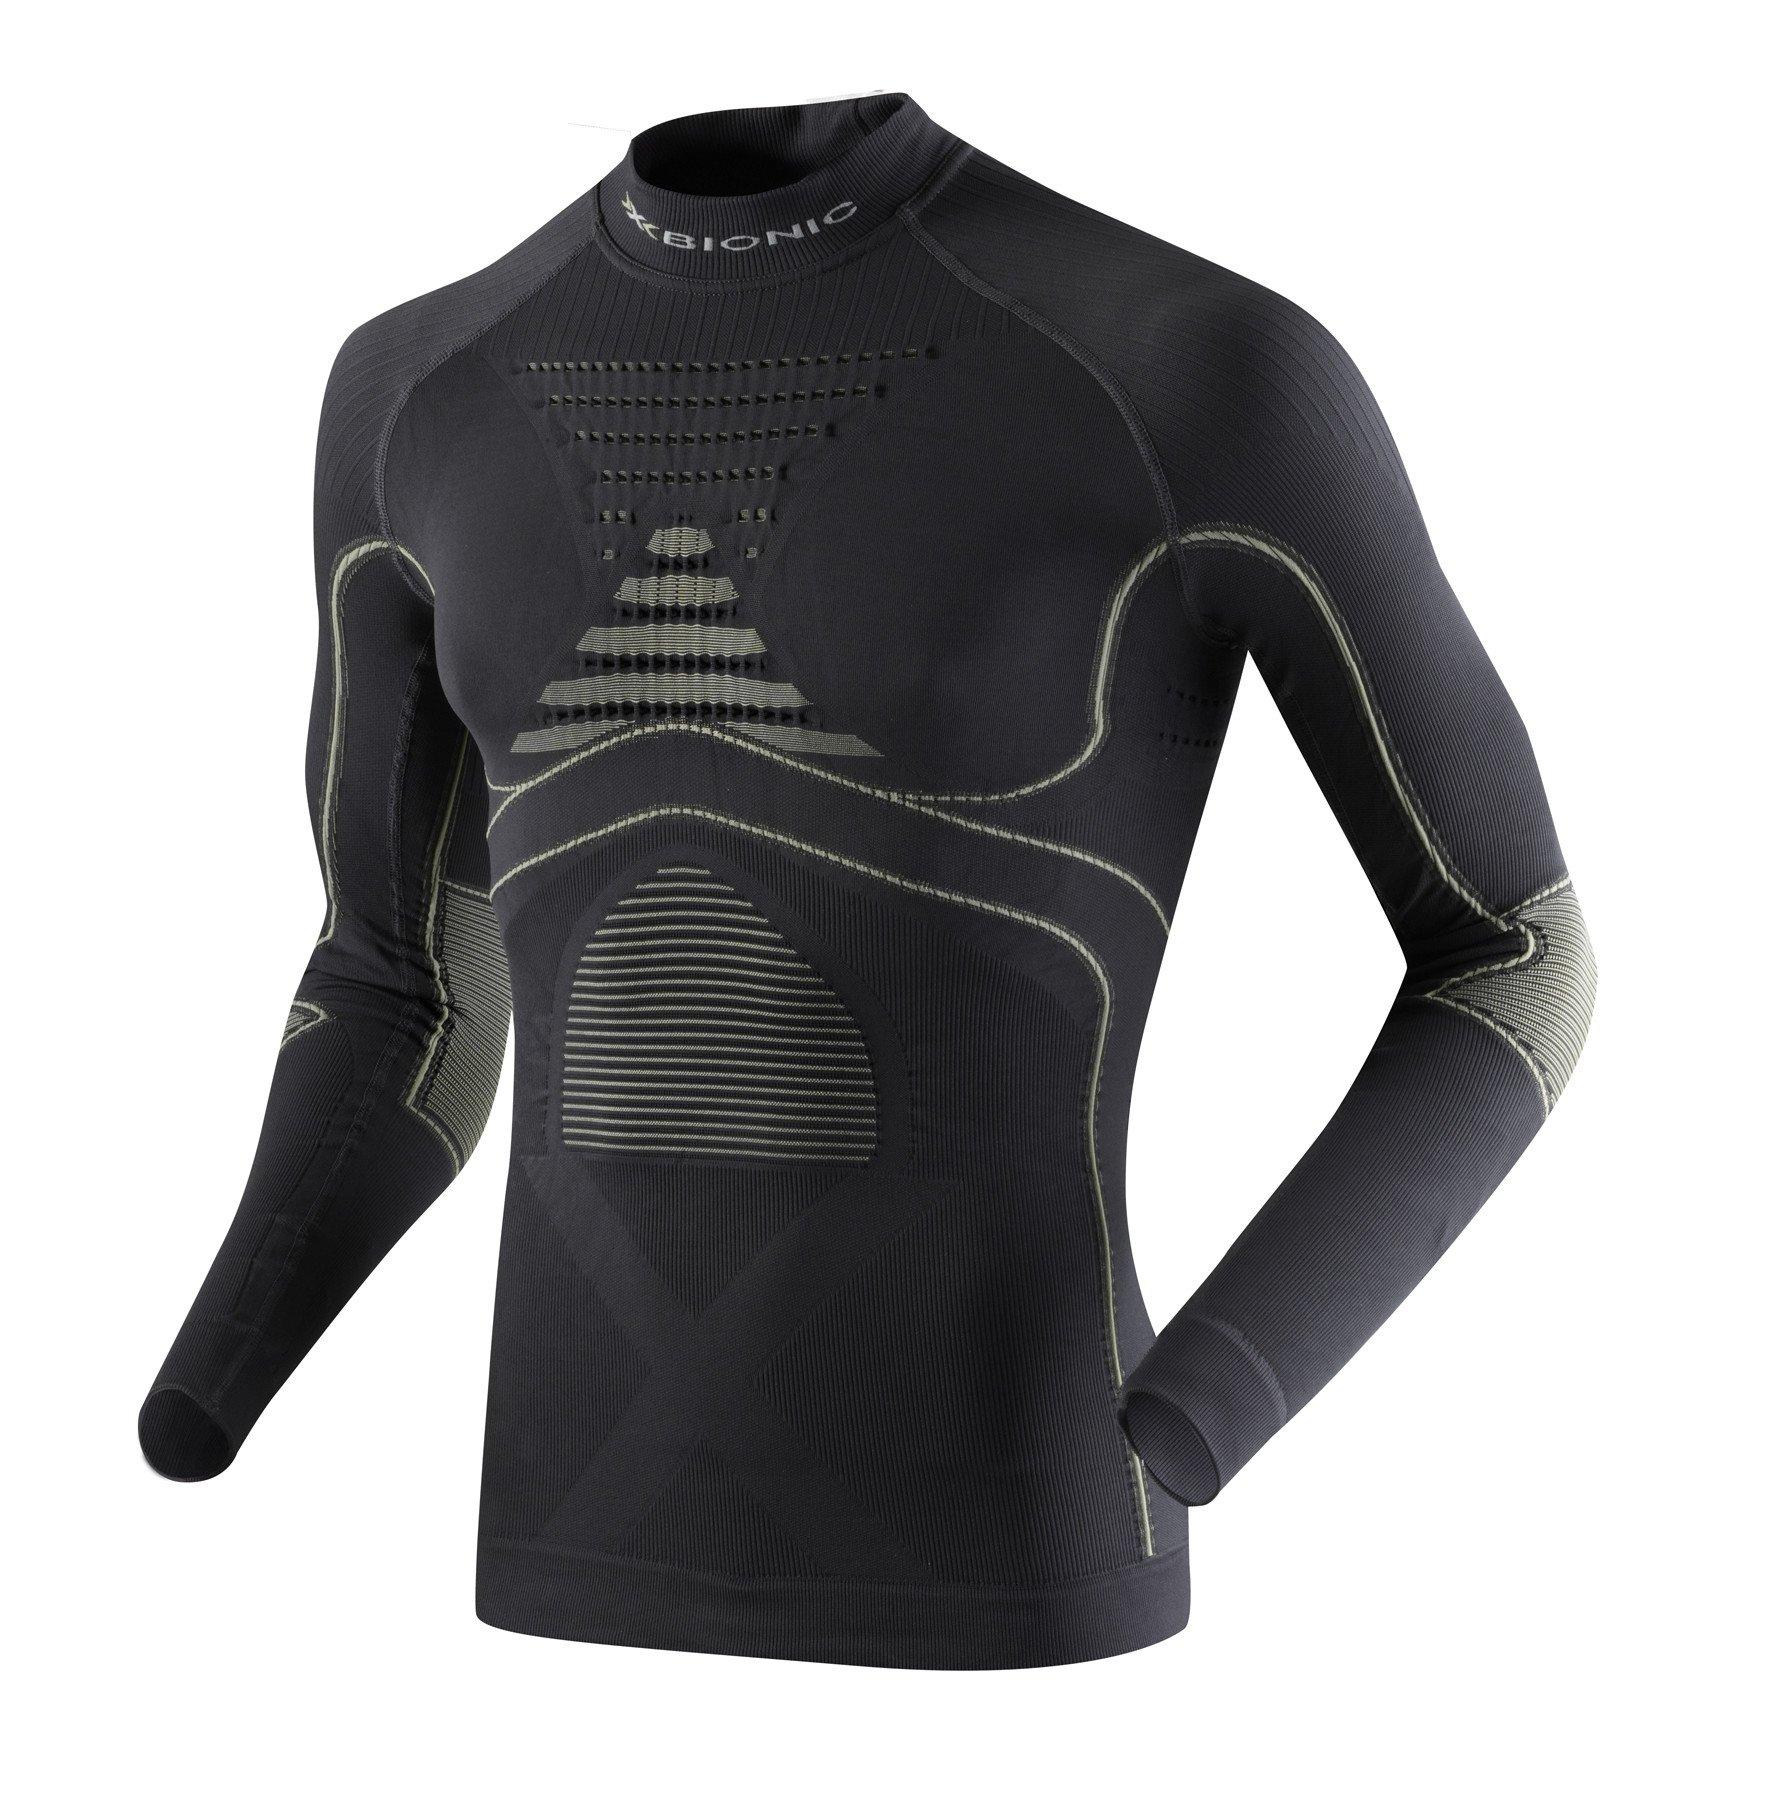 c18342db63 X-Bionic Accumulator ® EVO Energy Camiseta Larga Sleeves Turtle Neck Men  (Charcoal Grey) Pearl